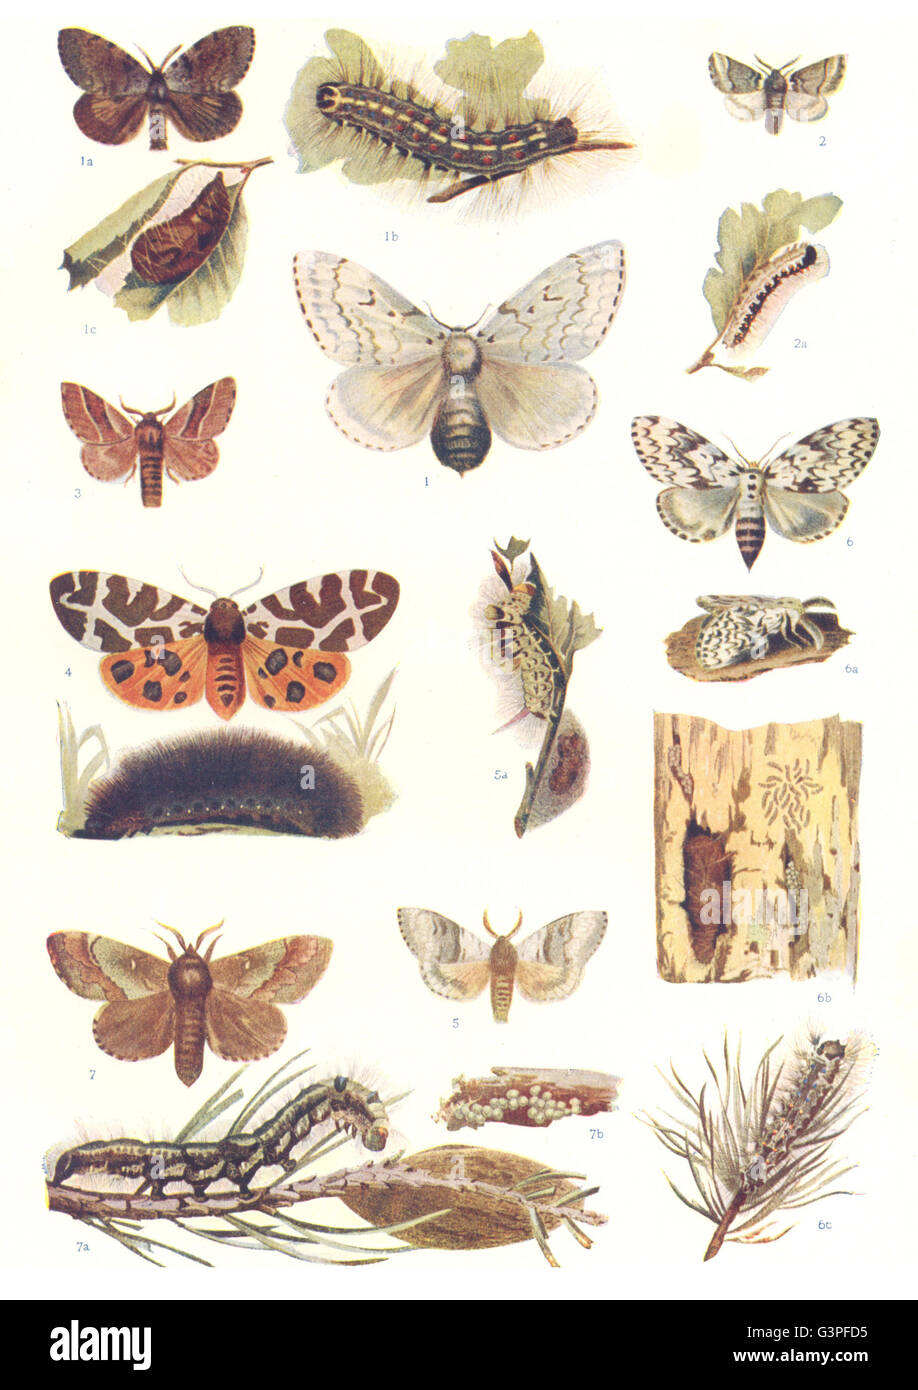 MOTHS: Gypsy, Tiger, Psilura, Lackey, Tussock, Pine; caterpillar; Pupa, 1907 - Stock Image